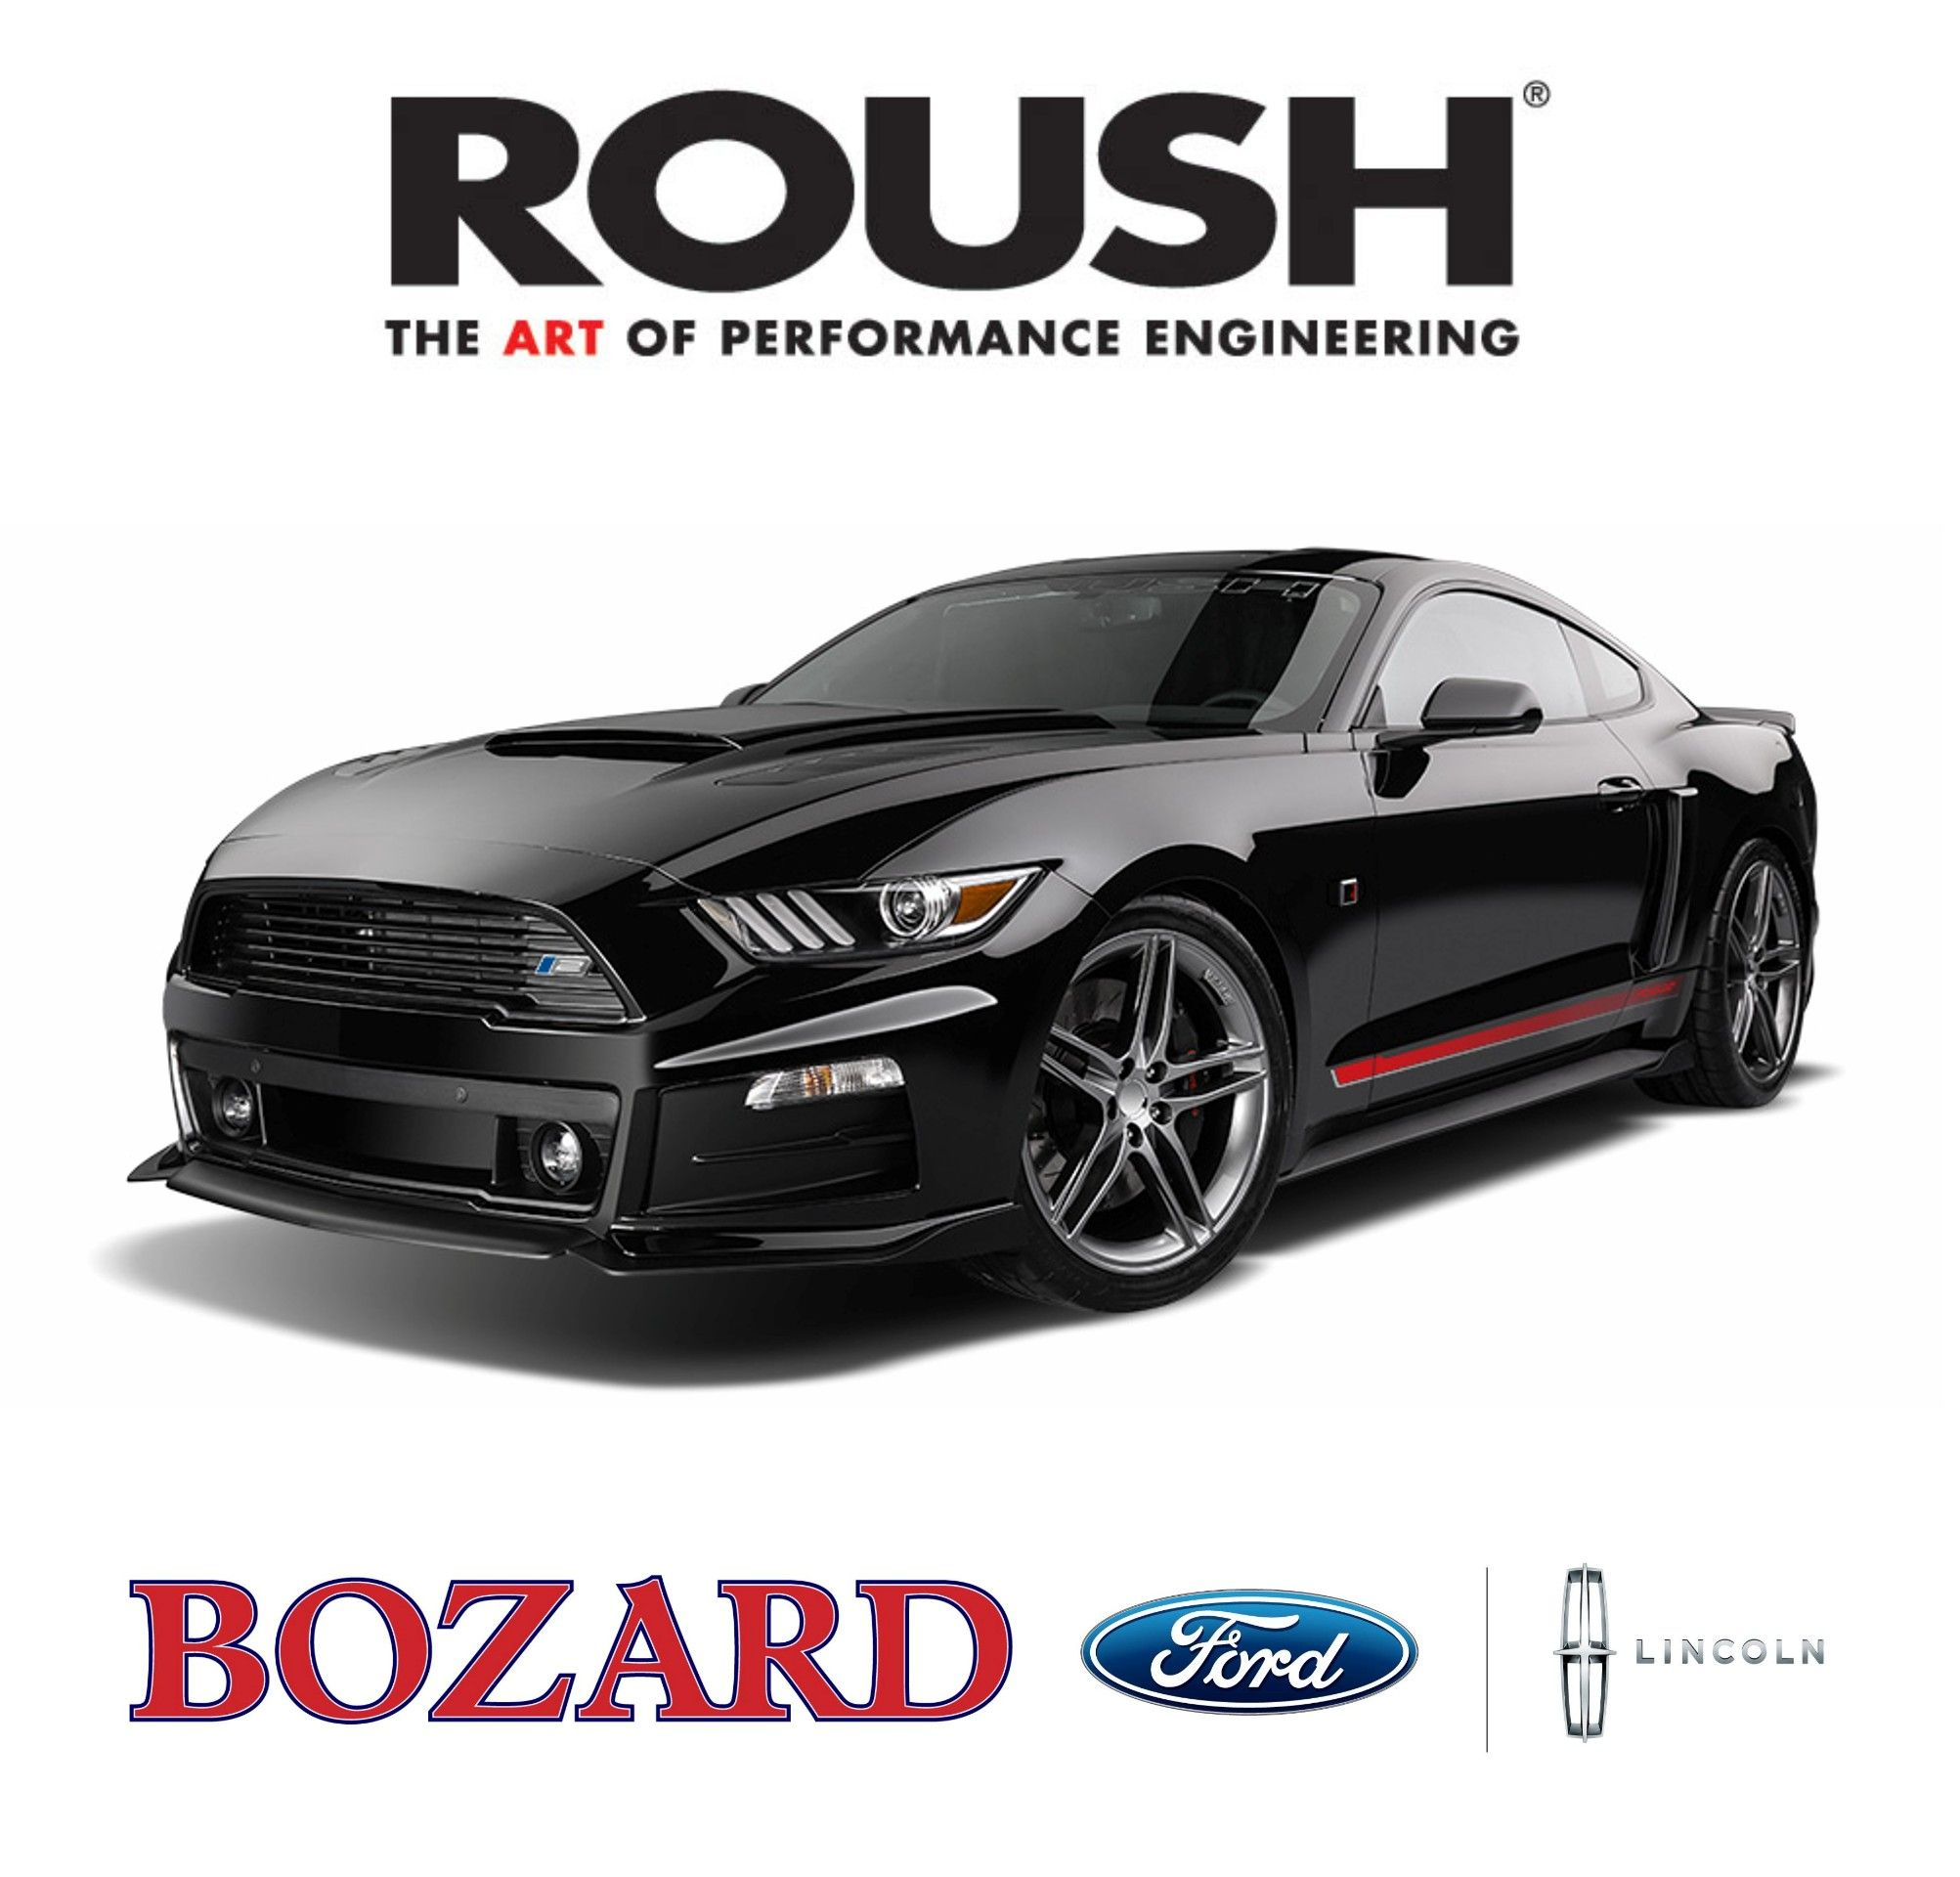 2015 Roush Mustang Http Bozardford Com New Ford Mustang Roush